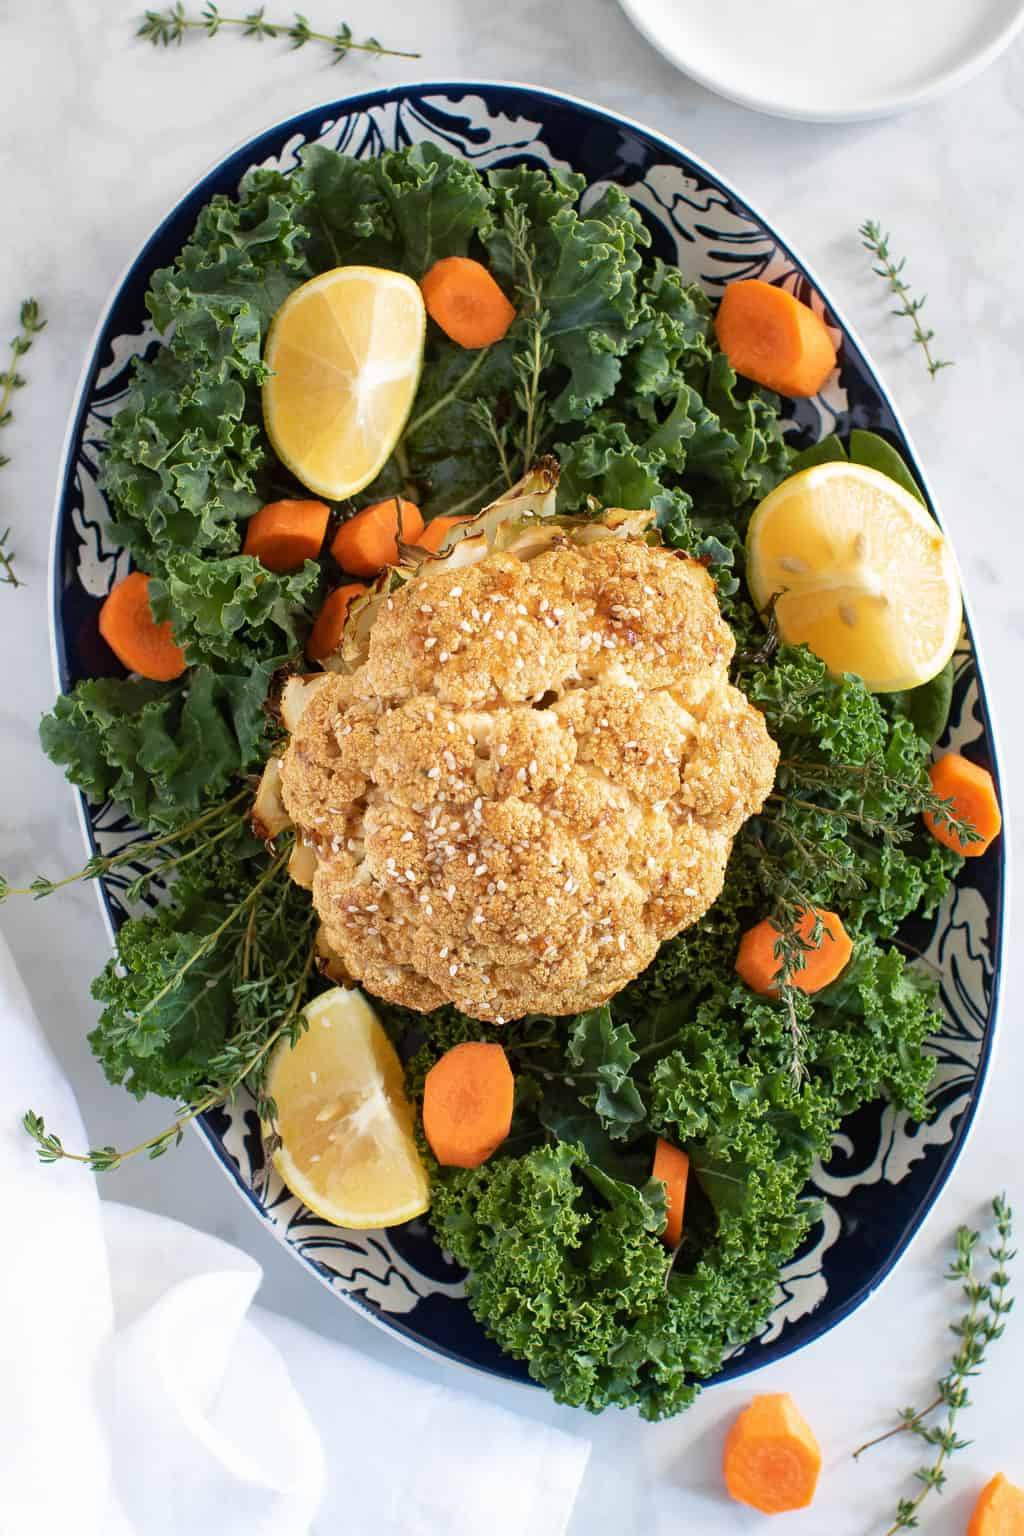 Sticky Teriyaki + Maple Whole Roasted Cauliflower